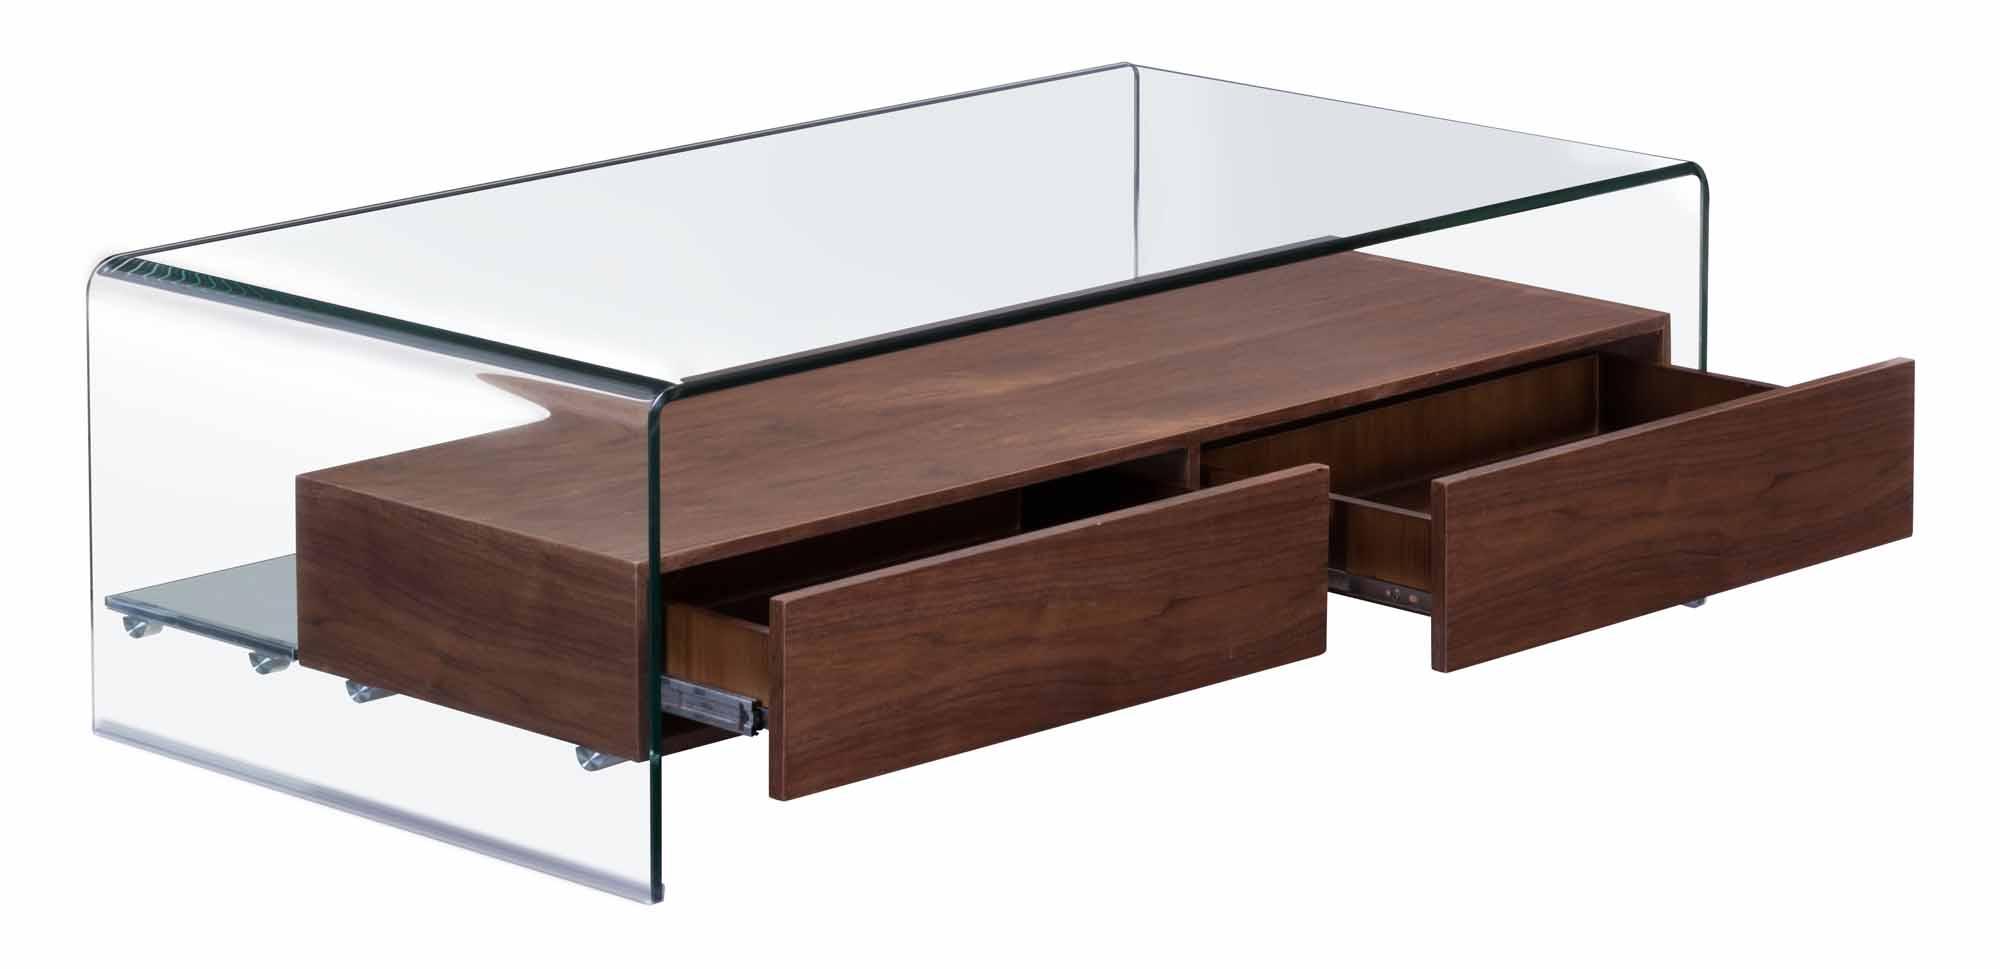 Shaman Coffee Table Walnut by Zuo Modern